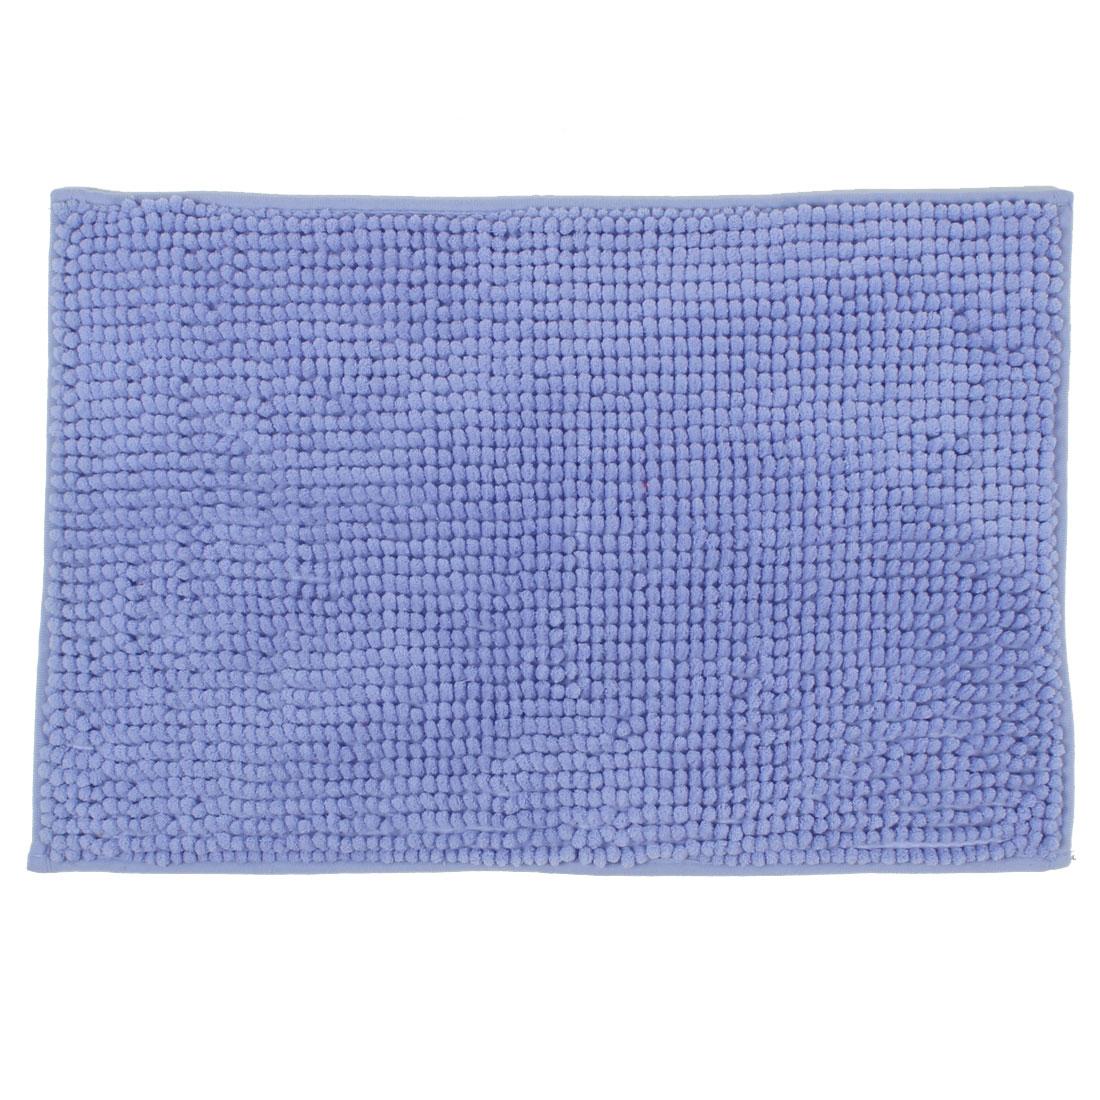 Household Bathroom Restaurant Soft Non Slip Absorbent Bath Mat Blue 24 x 16 Inch